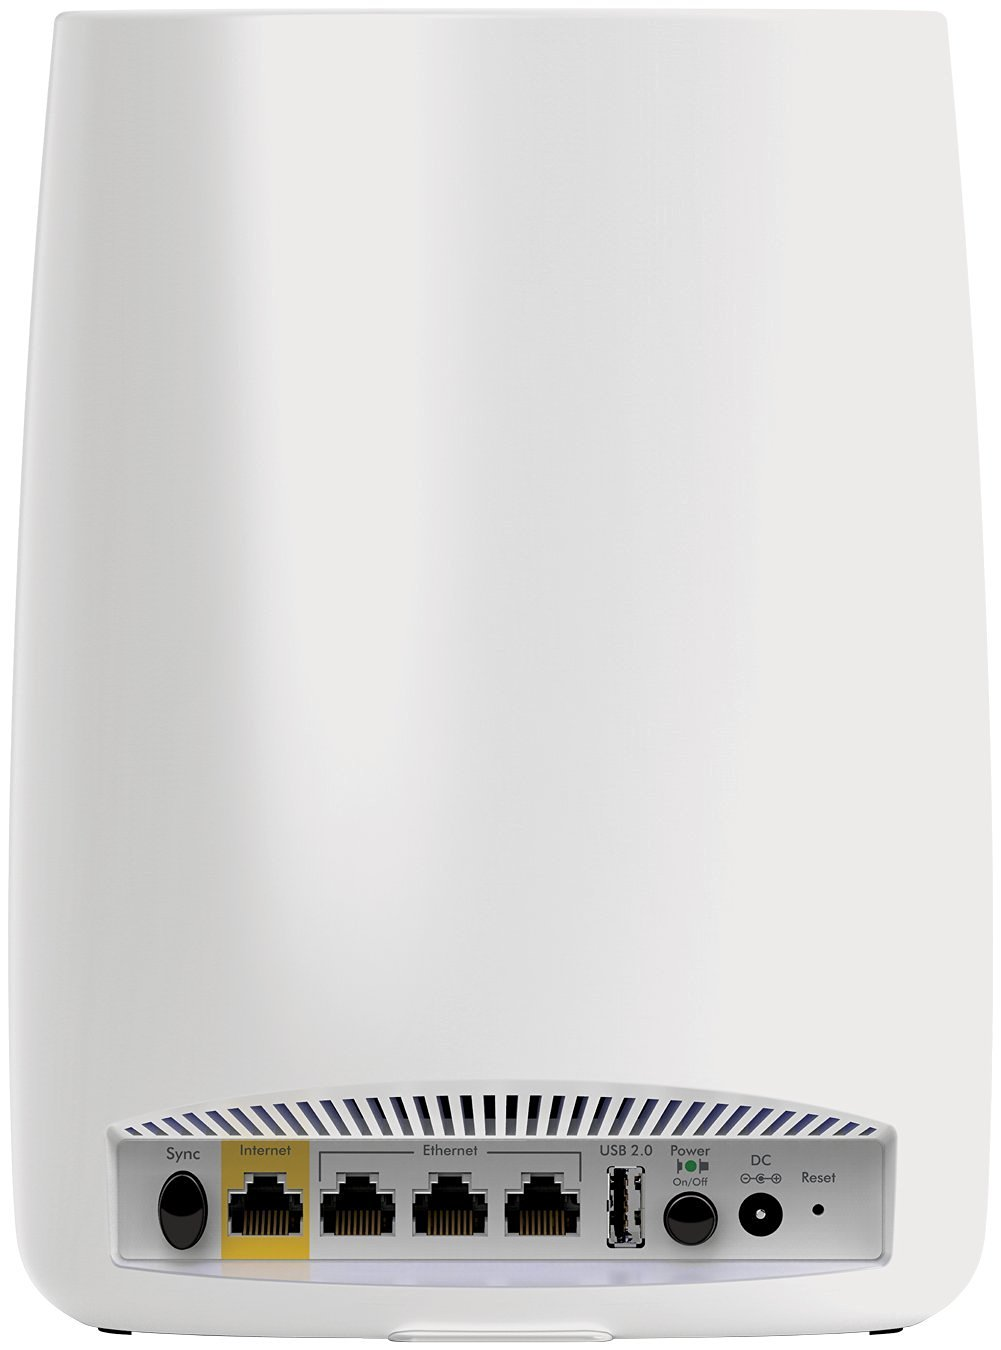 Review Netgear Orbi Ac3000 Tri Band Wifi System Rbk50